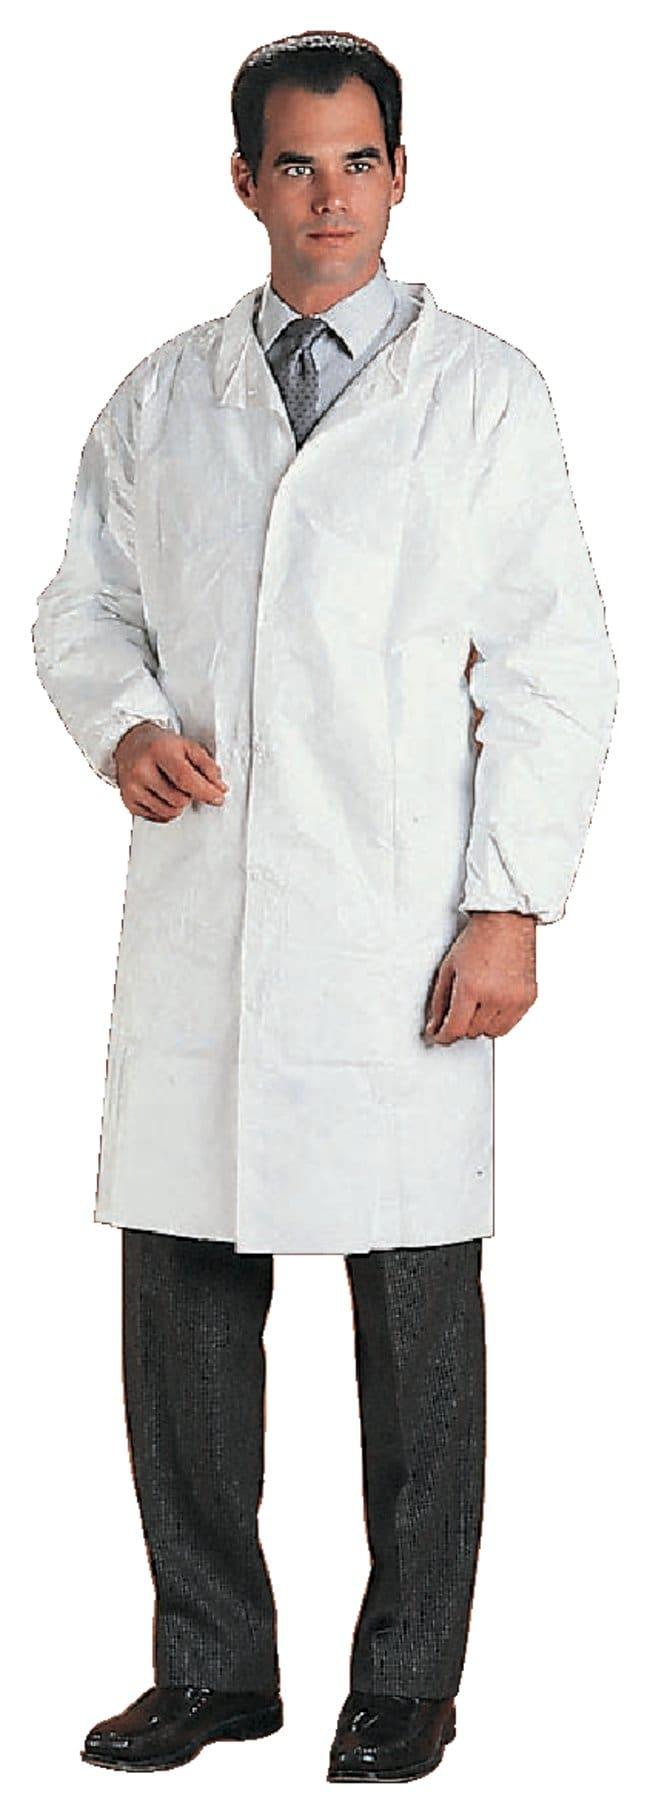 Tyvek™ Lab Coats